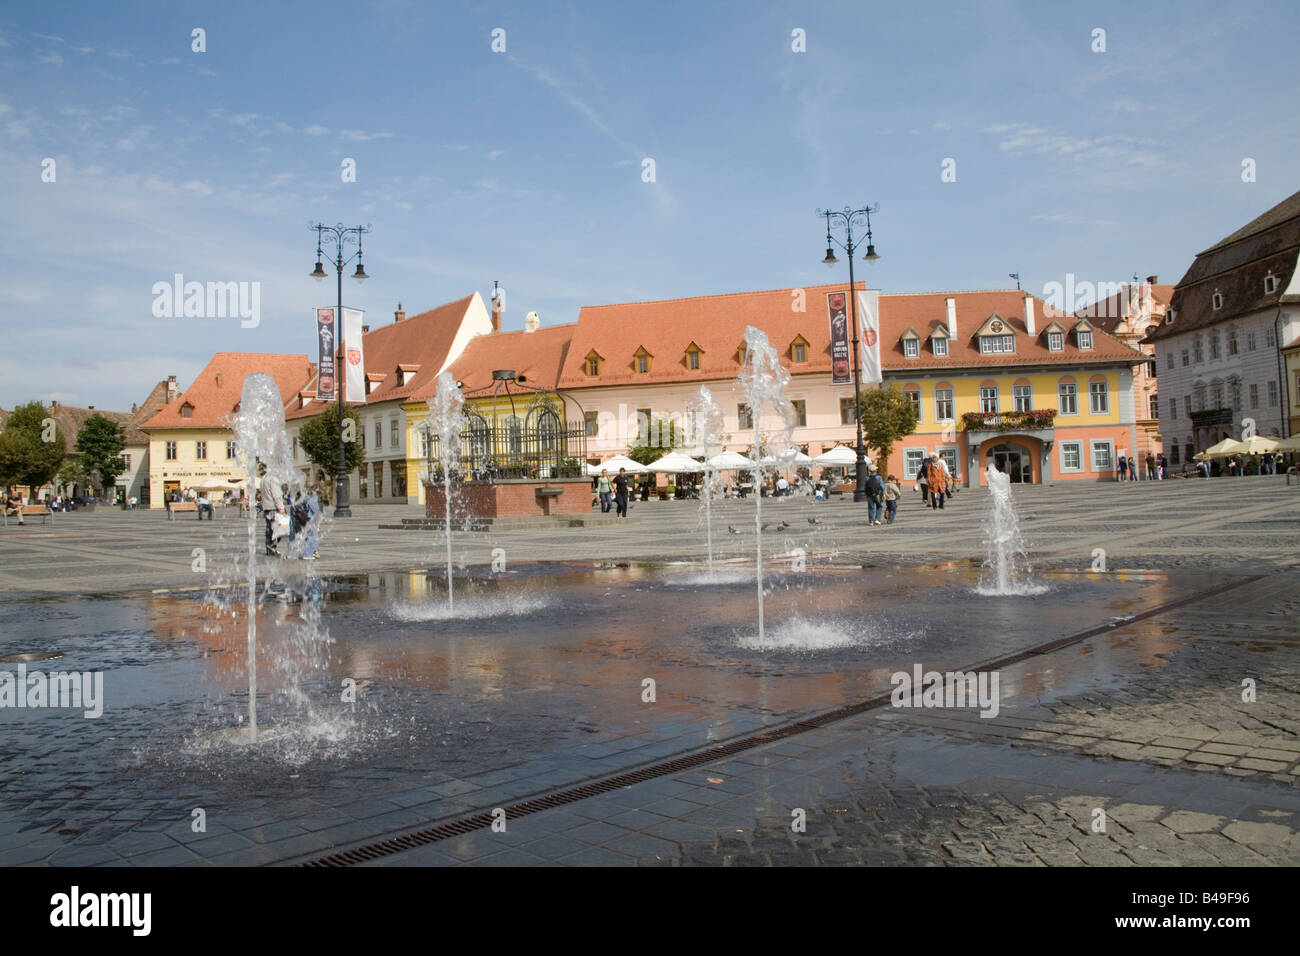 Sibiu Hermannstadt Transylvania Romania Europe September The water feature in traffic free Piata Mare - Stock Image